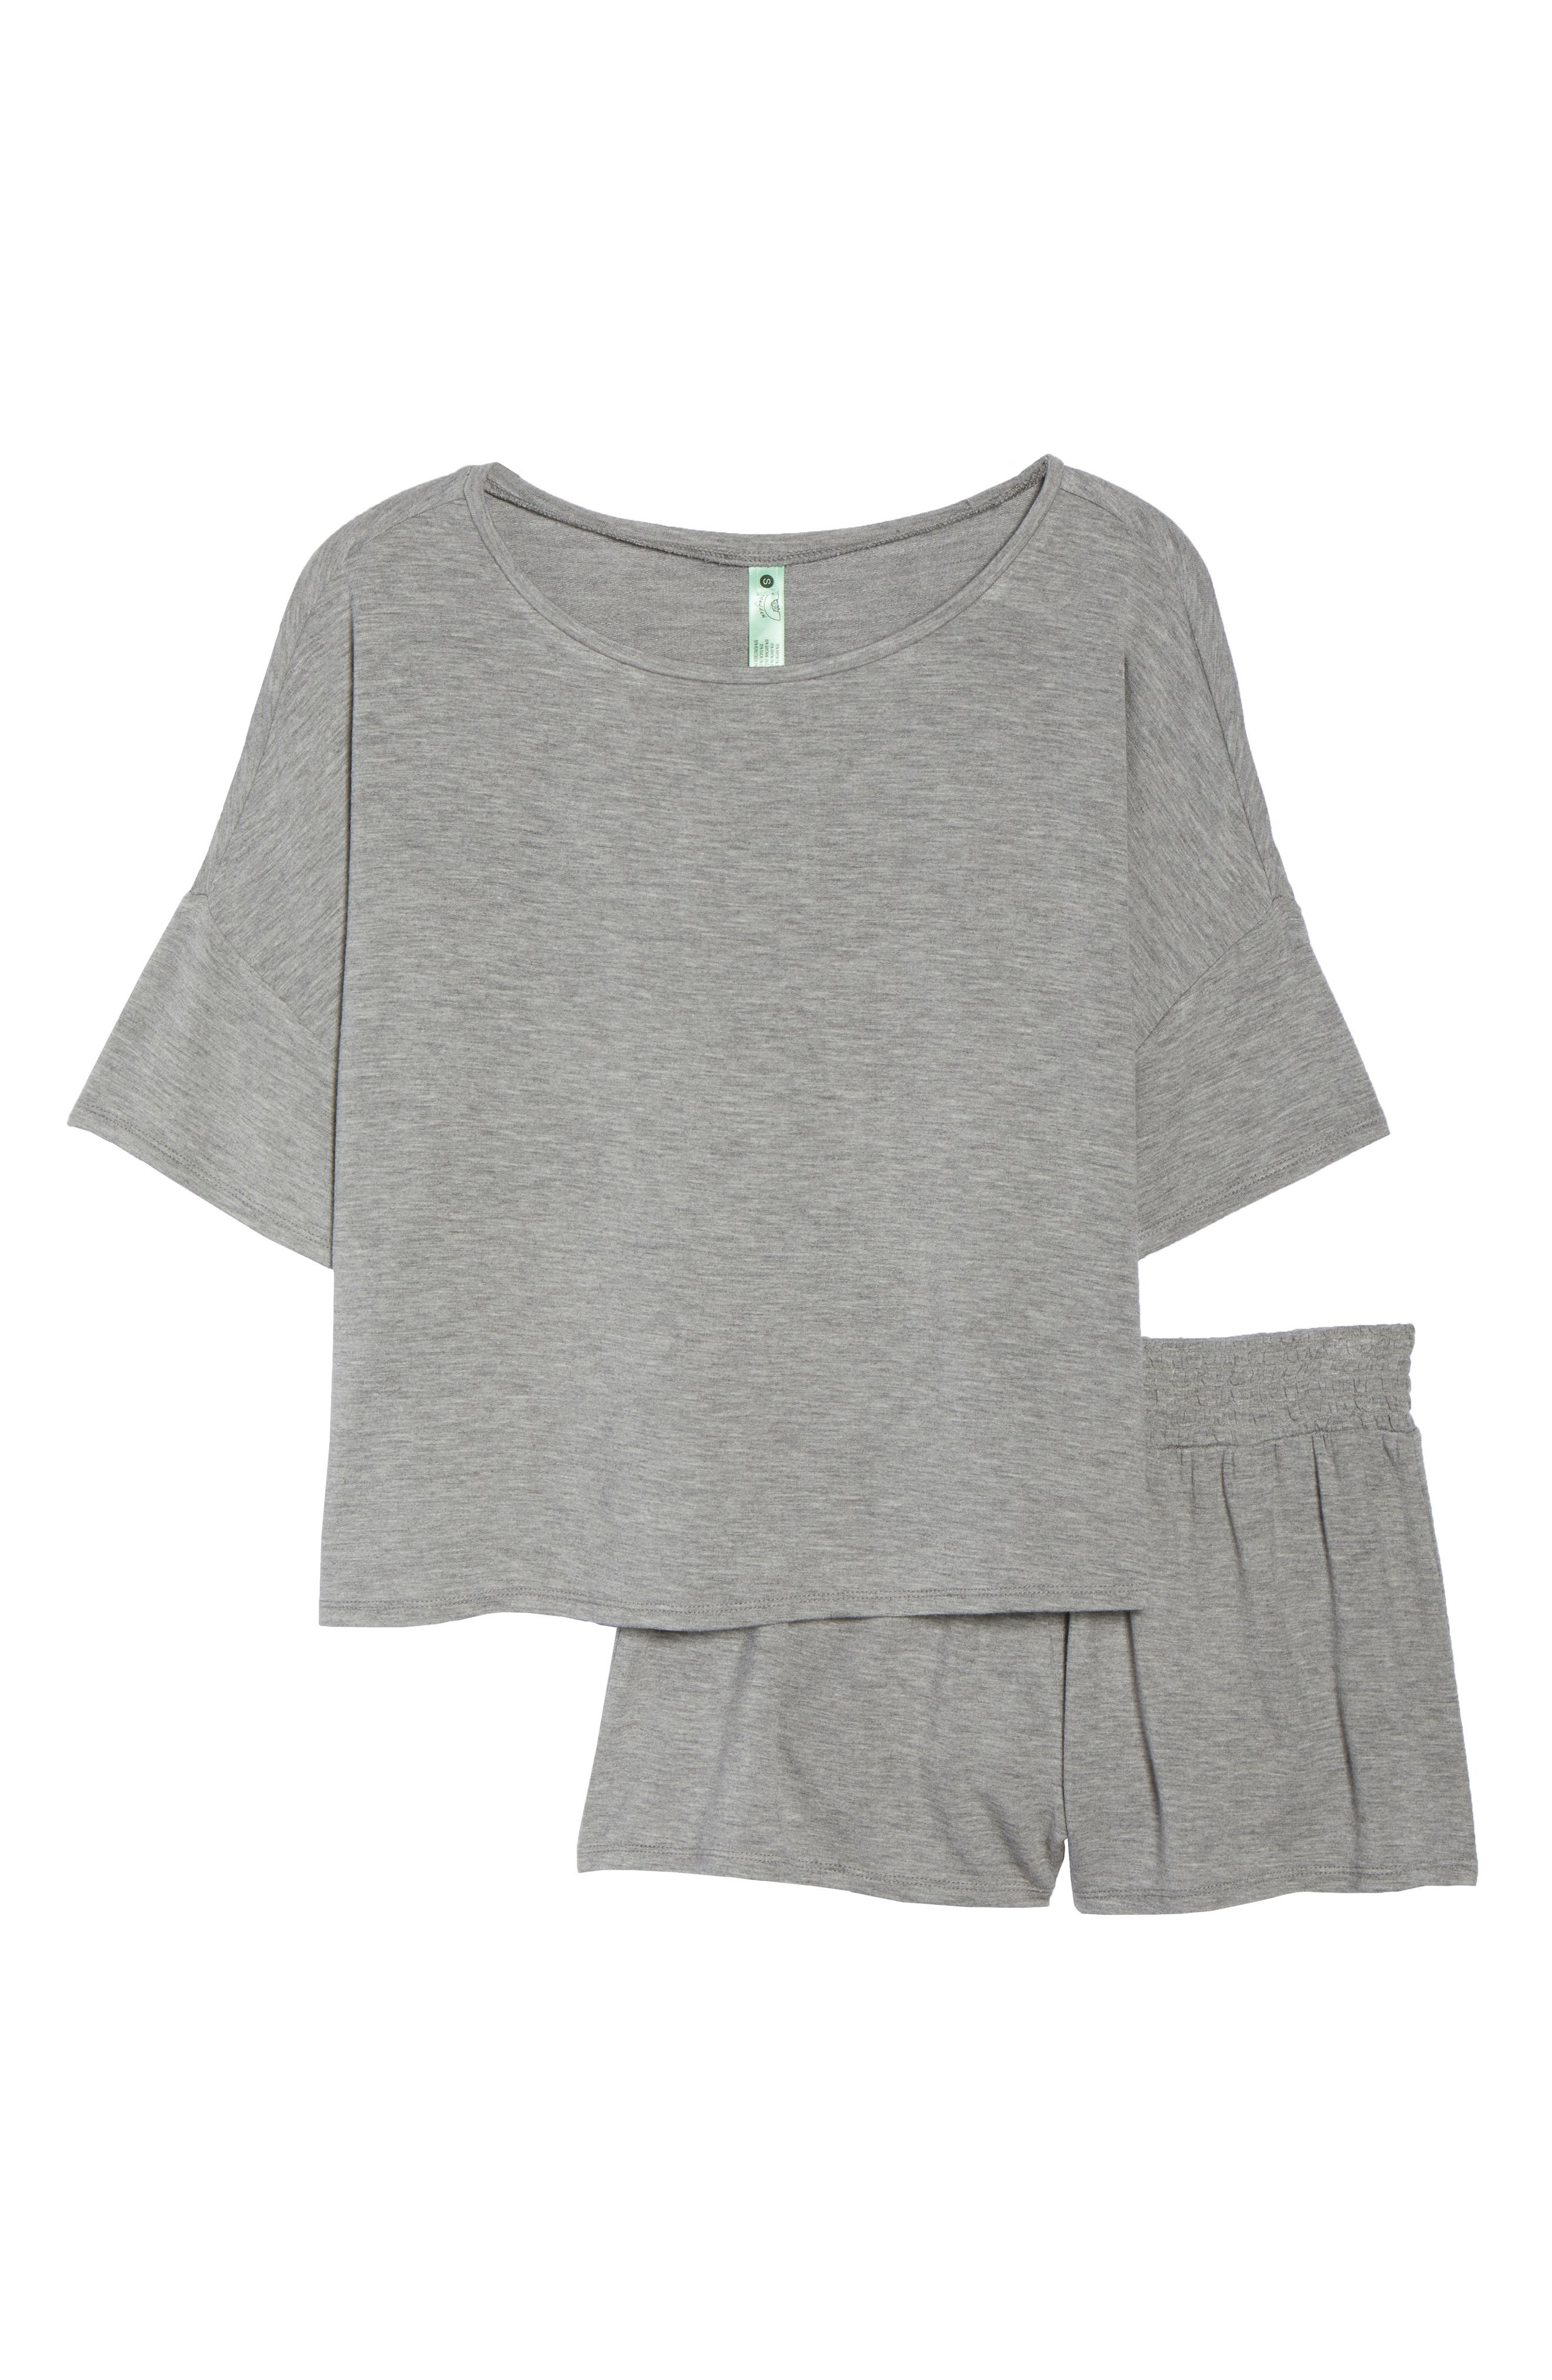 Short Pajamas,                             Alternate thumbnail 6, color,                             Heather Grey